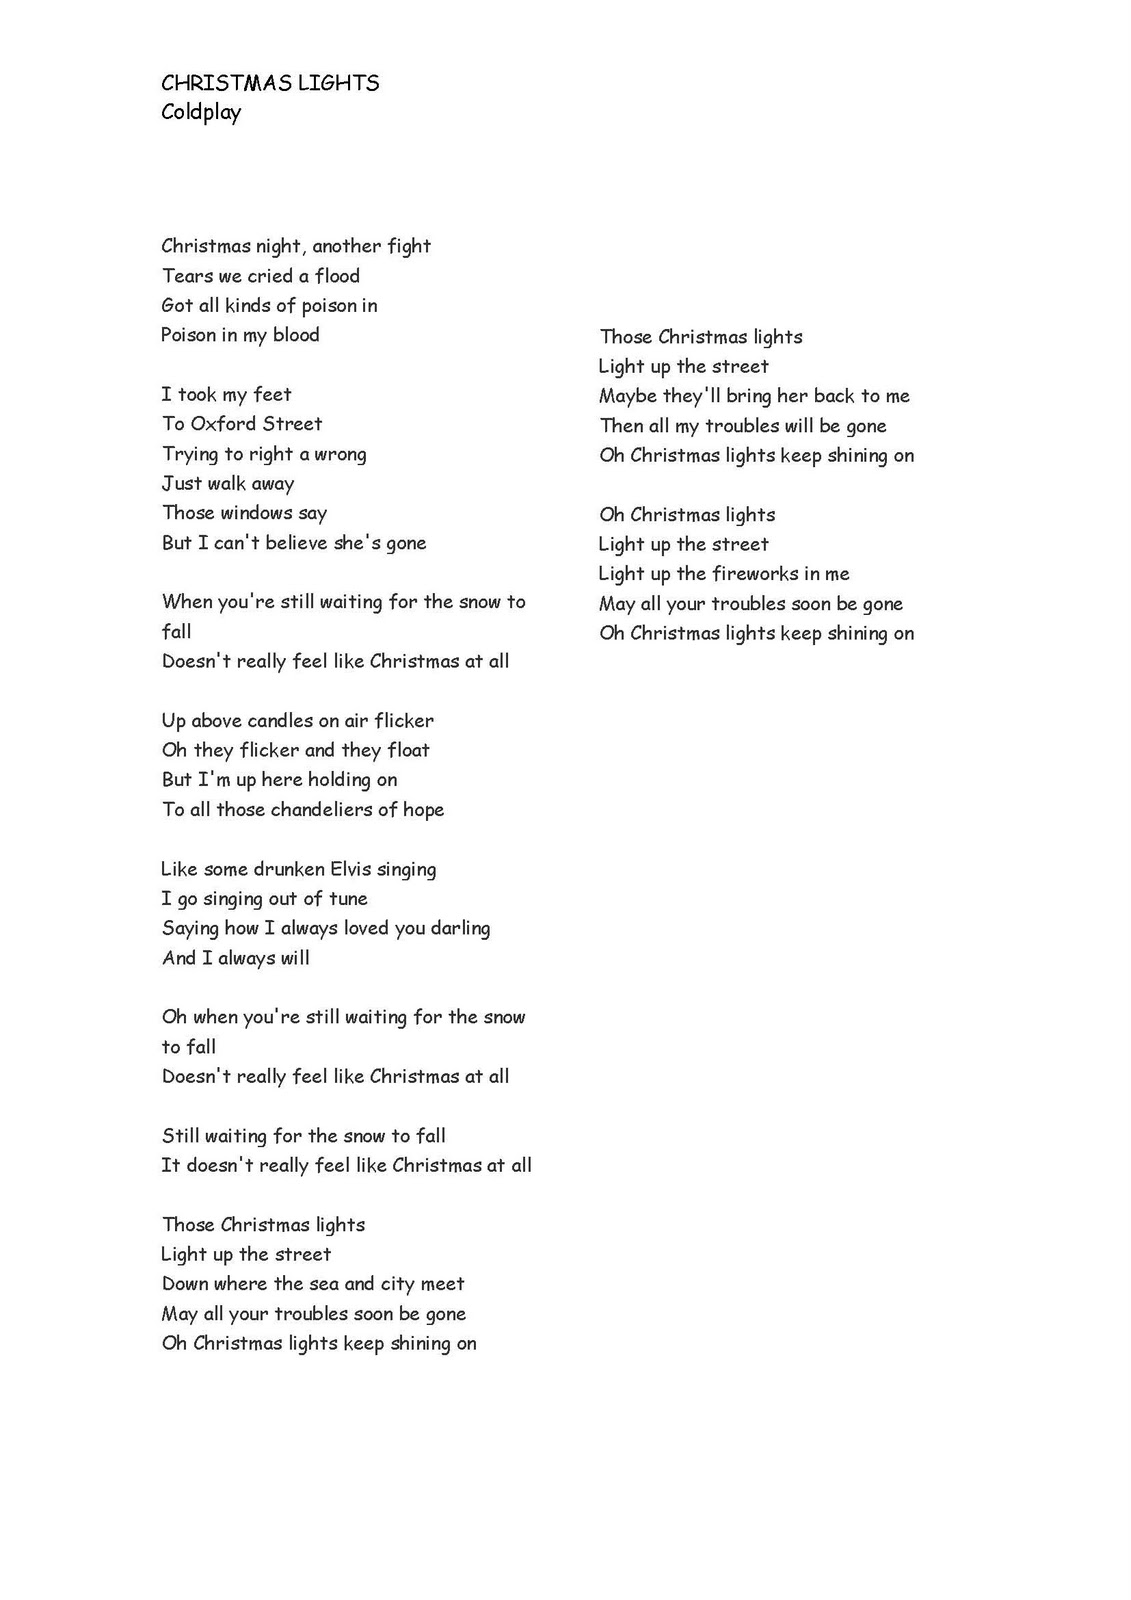 Christmas Light Coldplay Lyrics 7 Pin Flat Trailer Connector Wiring Diagram Lights